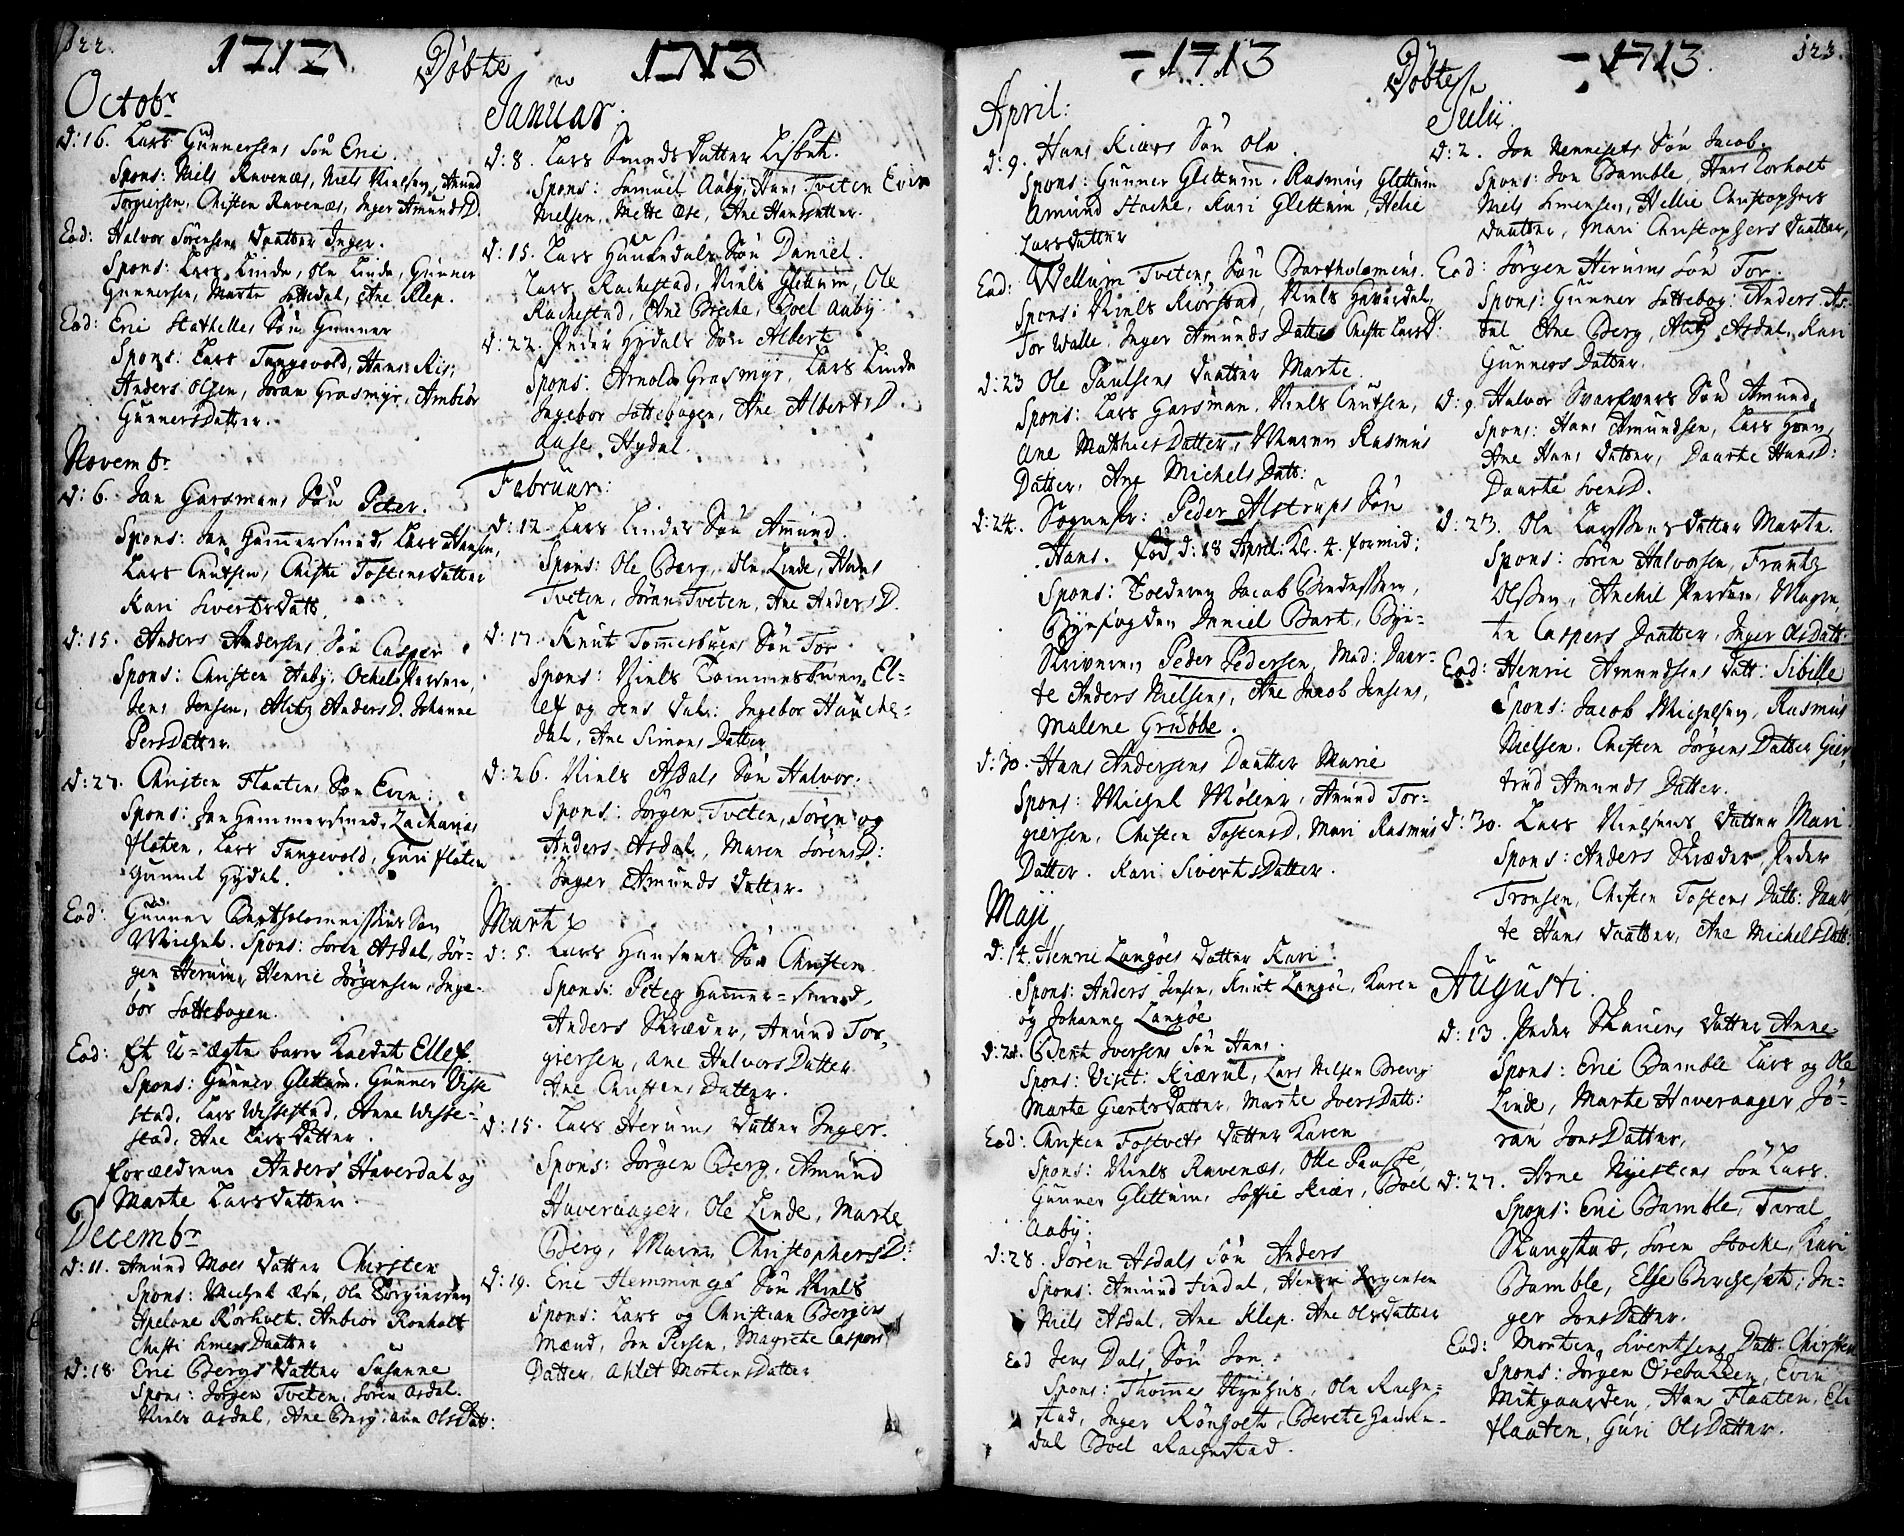 SAKO, Bamble kirkebøker, F/Fa/L0001: Ministerialbok nr. I 1, 1702-1774, s. 122-123